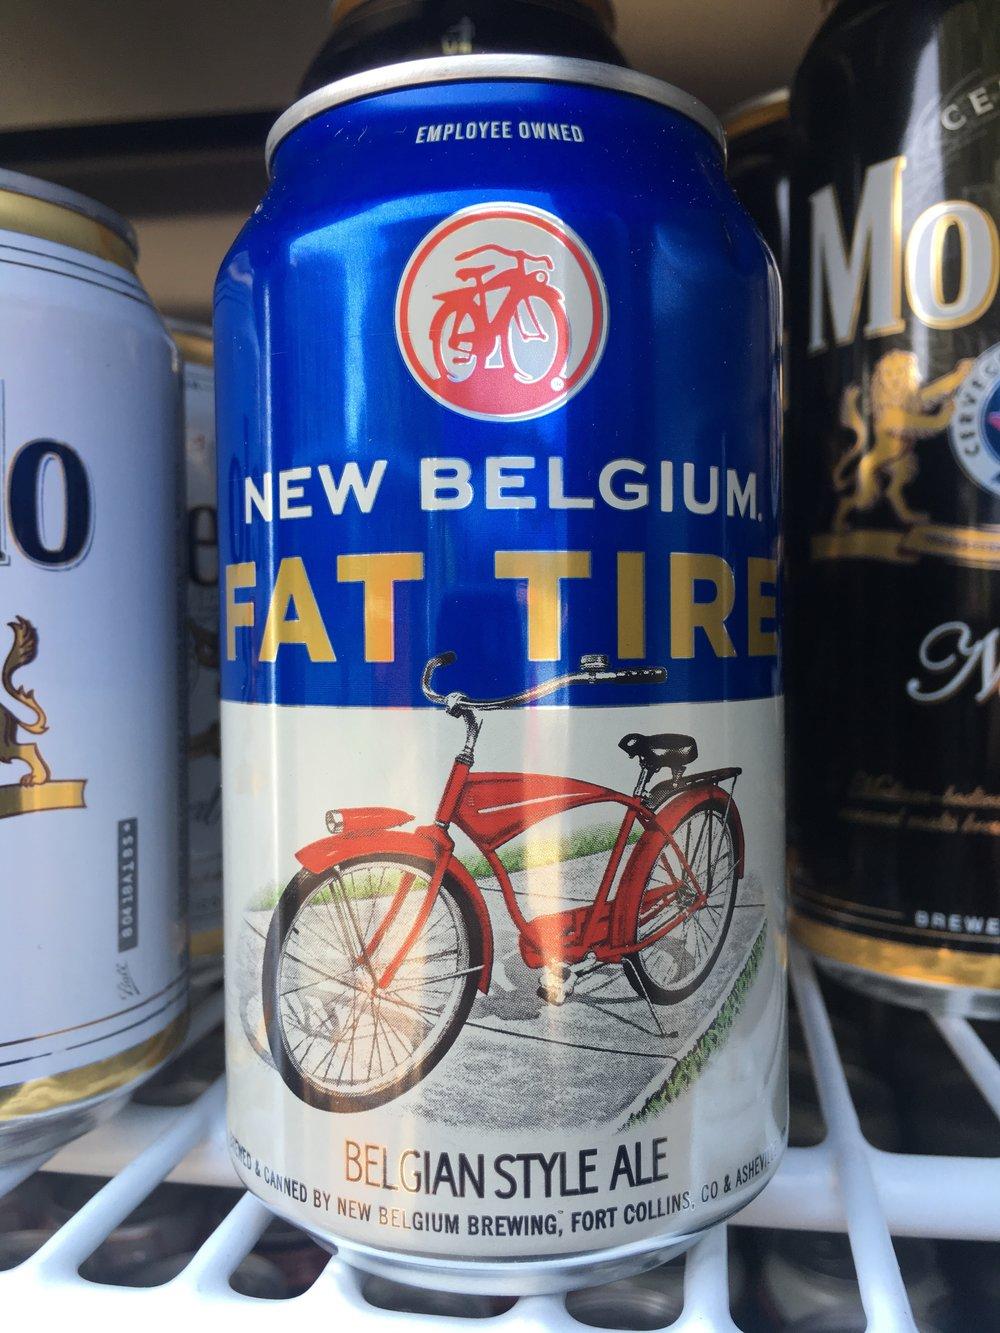 New Belgium - Fat Tire Belgian Style Ale